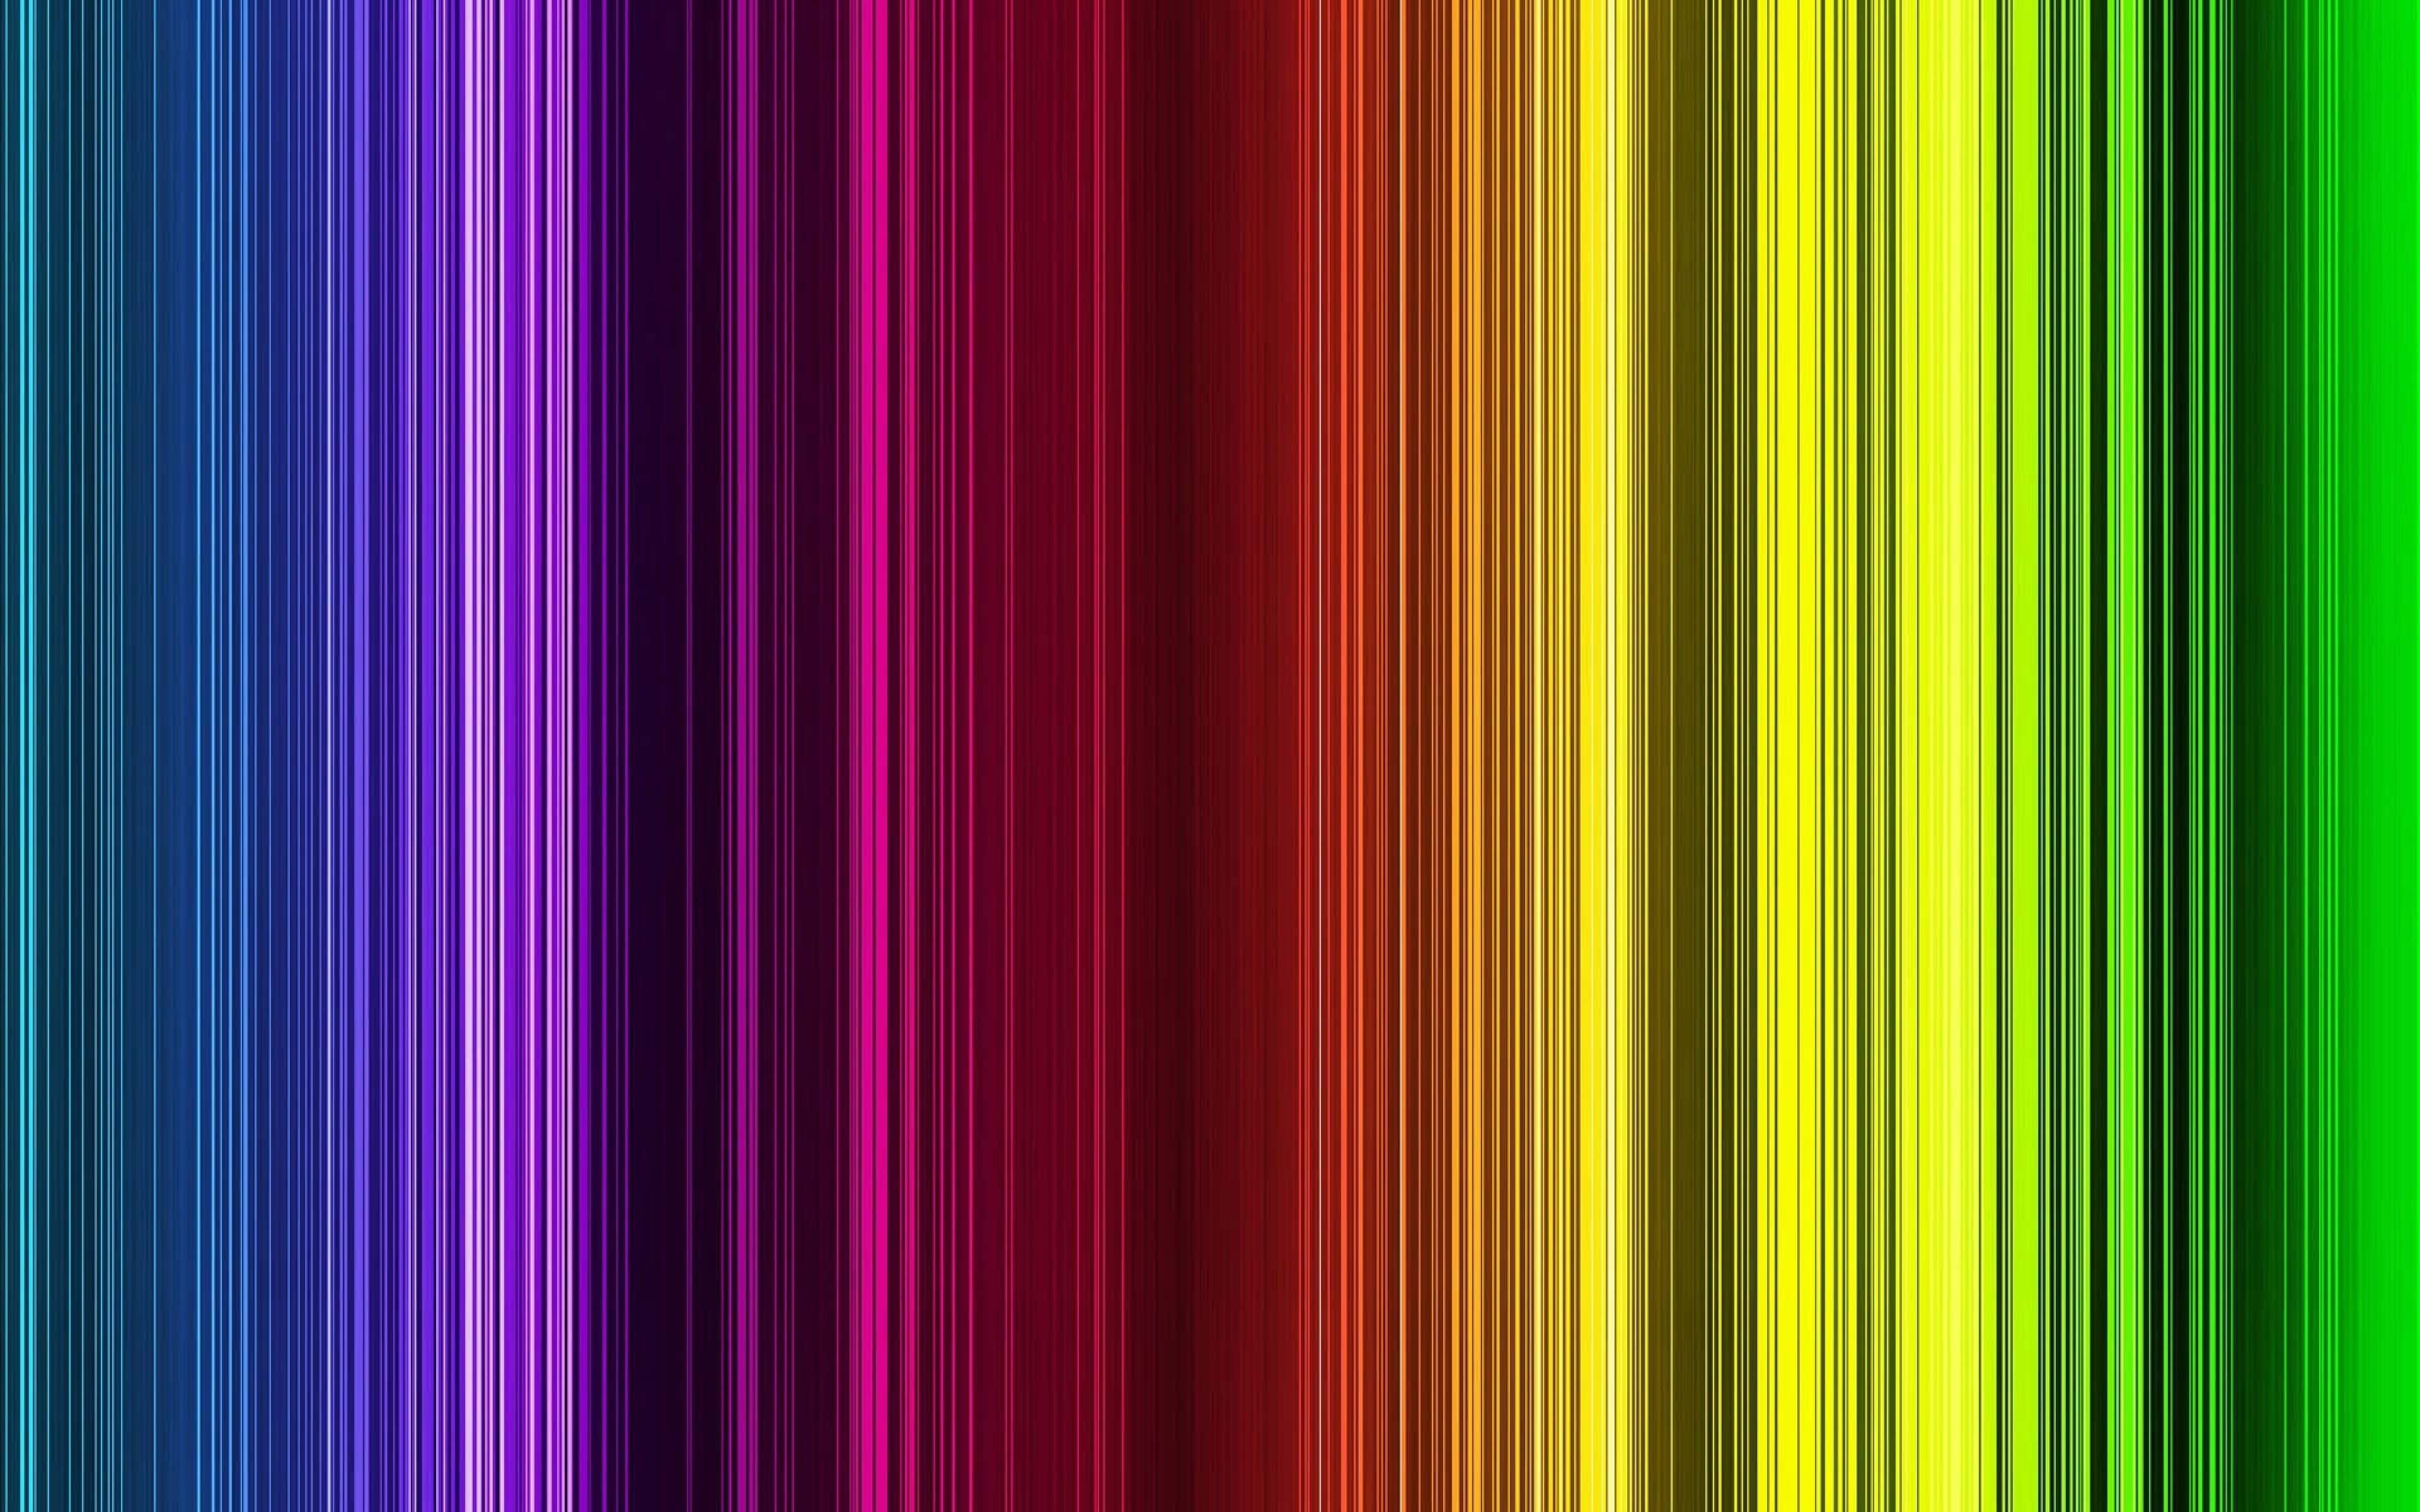 Simple The Worldus Ugliest Color Isu.